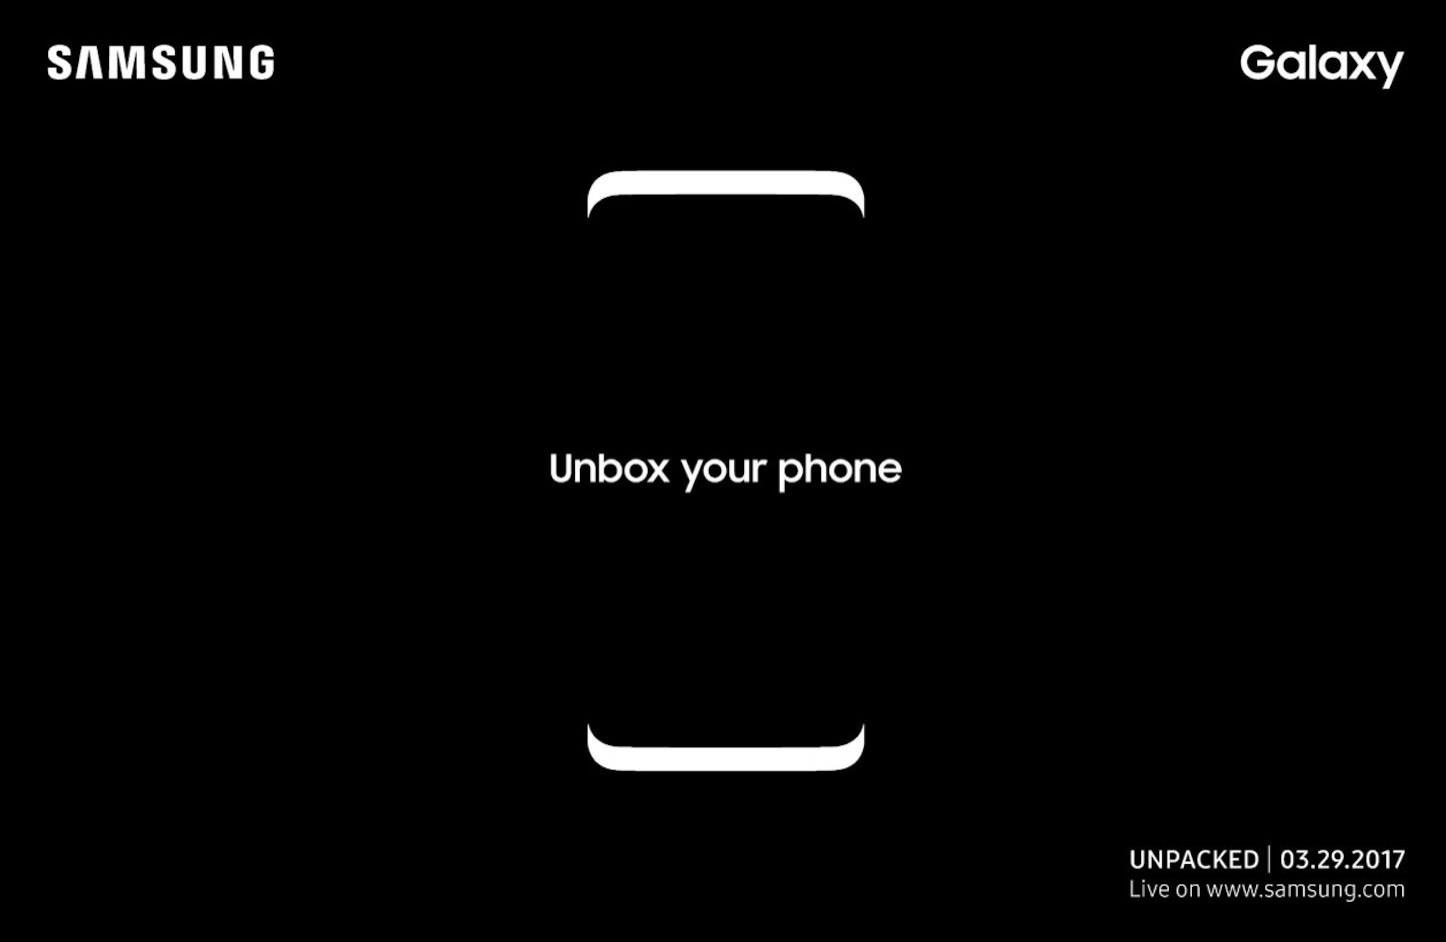 SAMSUNG、Galaxy S8を3/29開催の「Unpacked 2017」で正式発表へ!